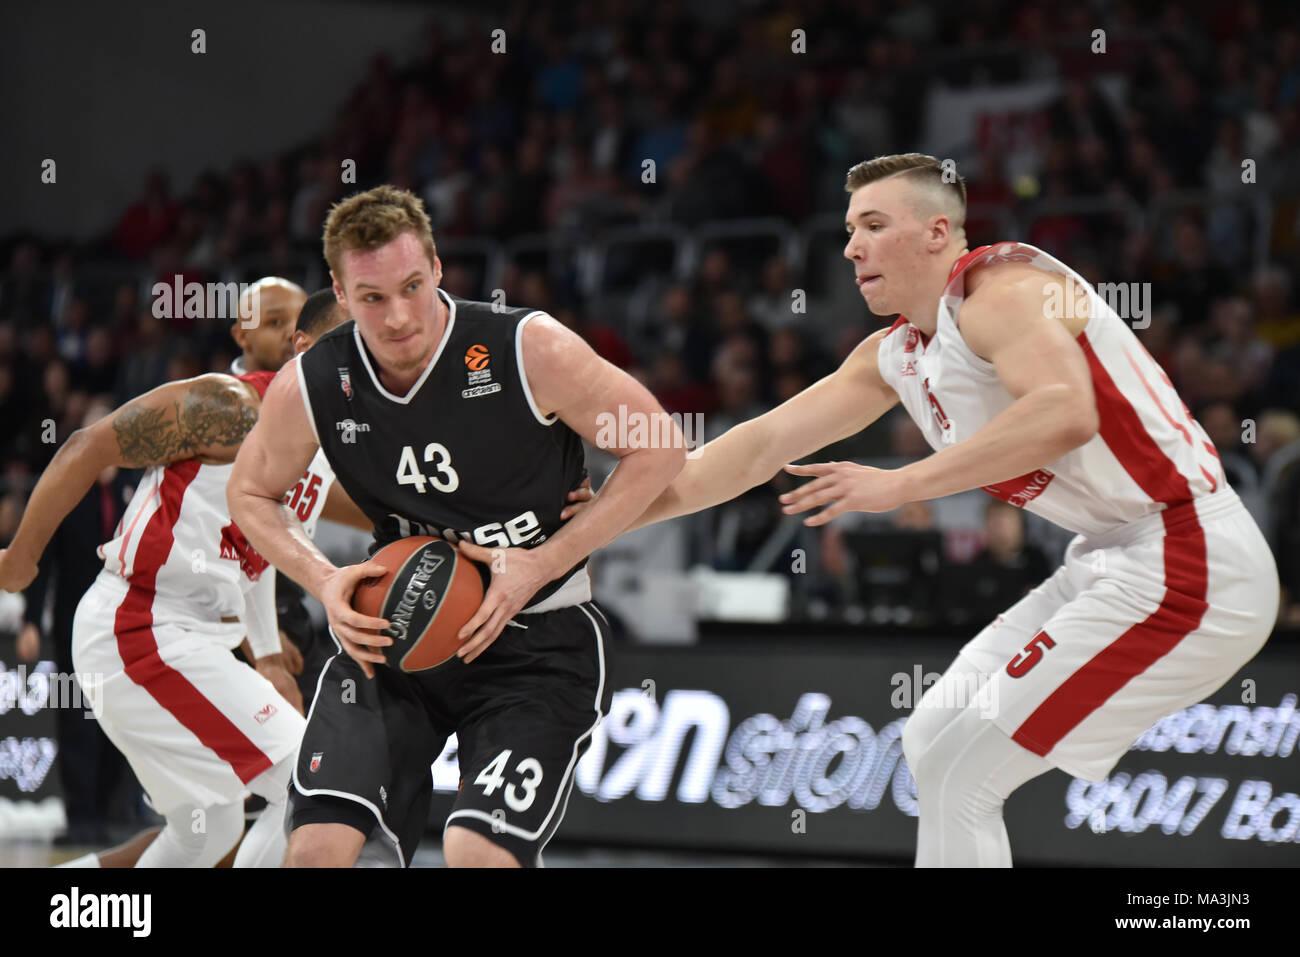 69719b31336 Germany , Bamberg, Brose Arena - 29 March 2018 - Basketball, Euro League -